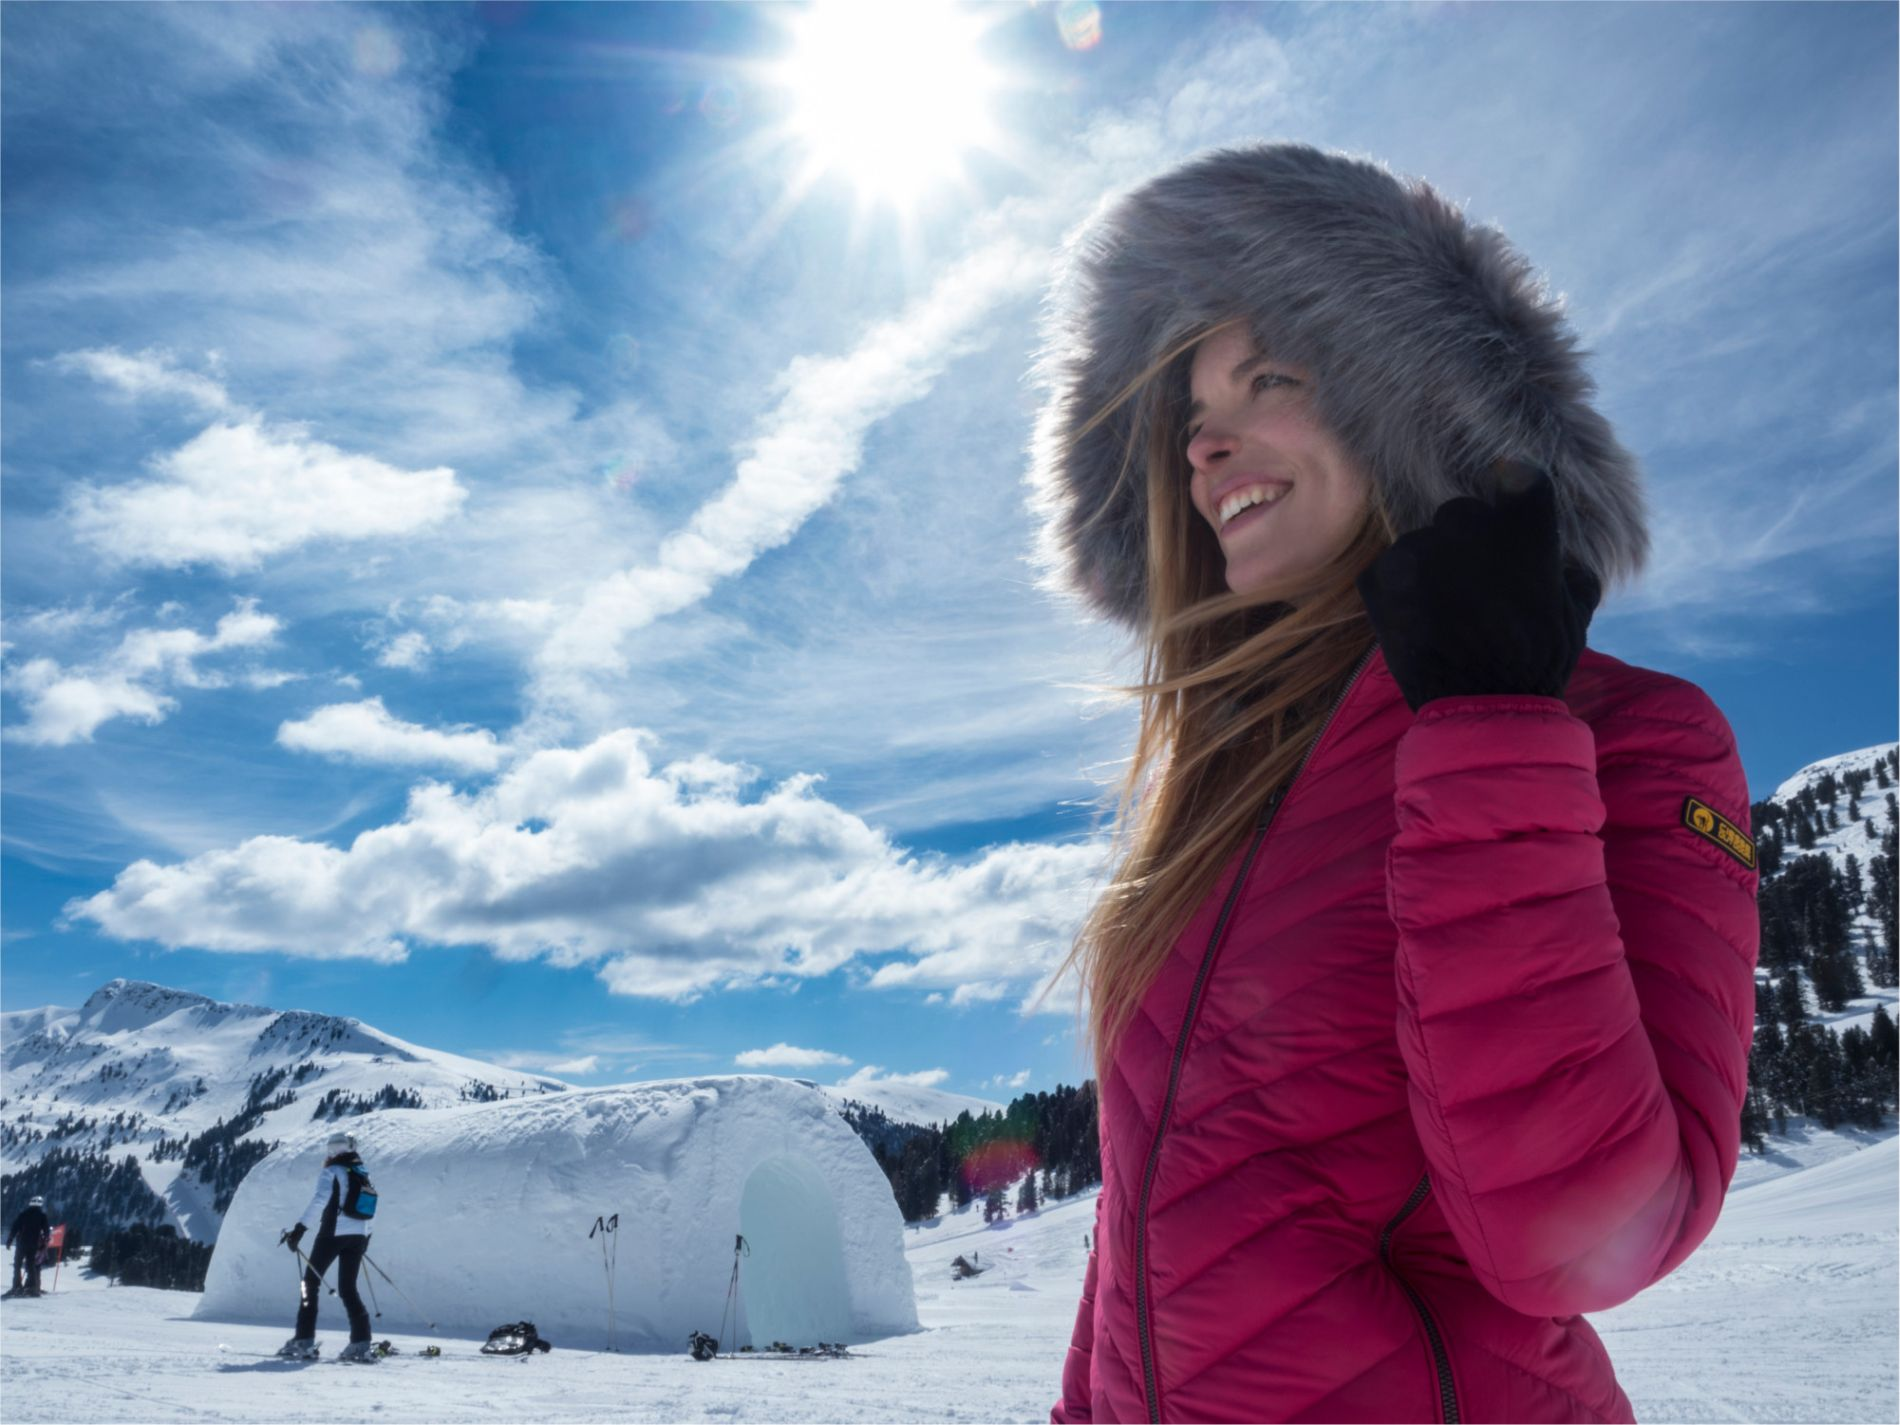 divertimento-sulla-neve-ski center latemar trentino alto adige